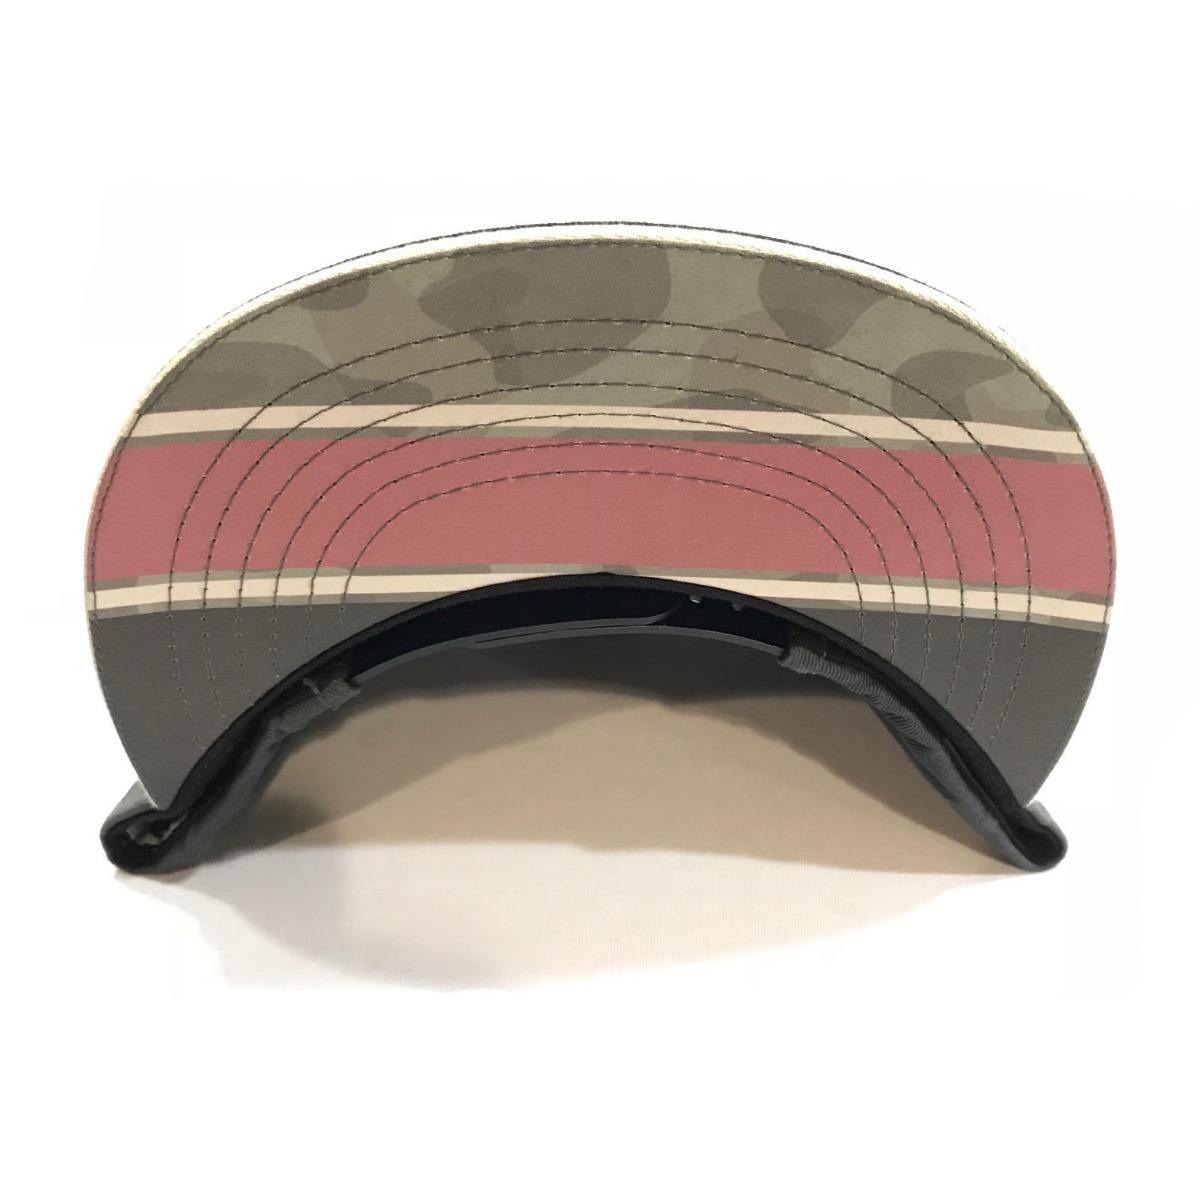 43b2d0dfddec3 Boné Rip Curl Game Line Flat Snapback Aberto - Regulador - R  155